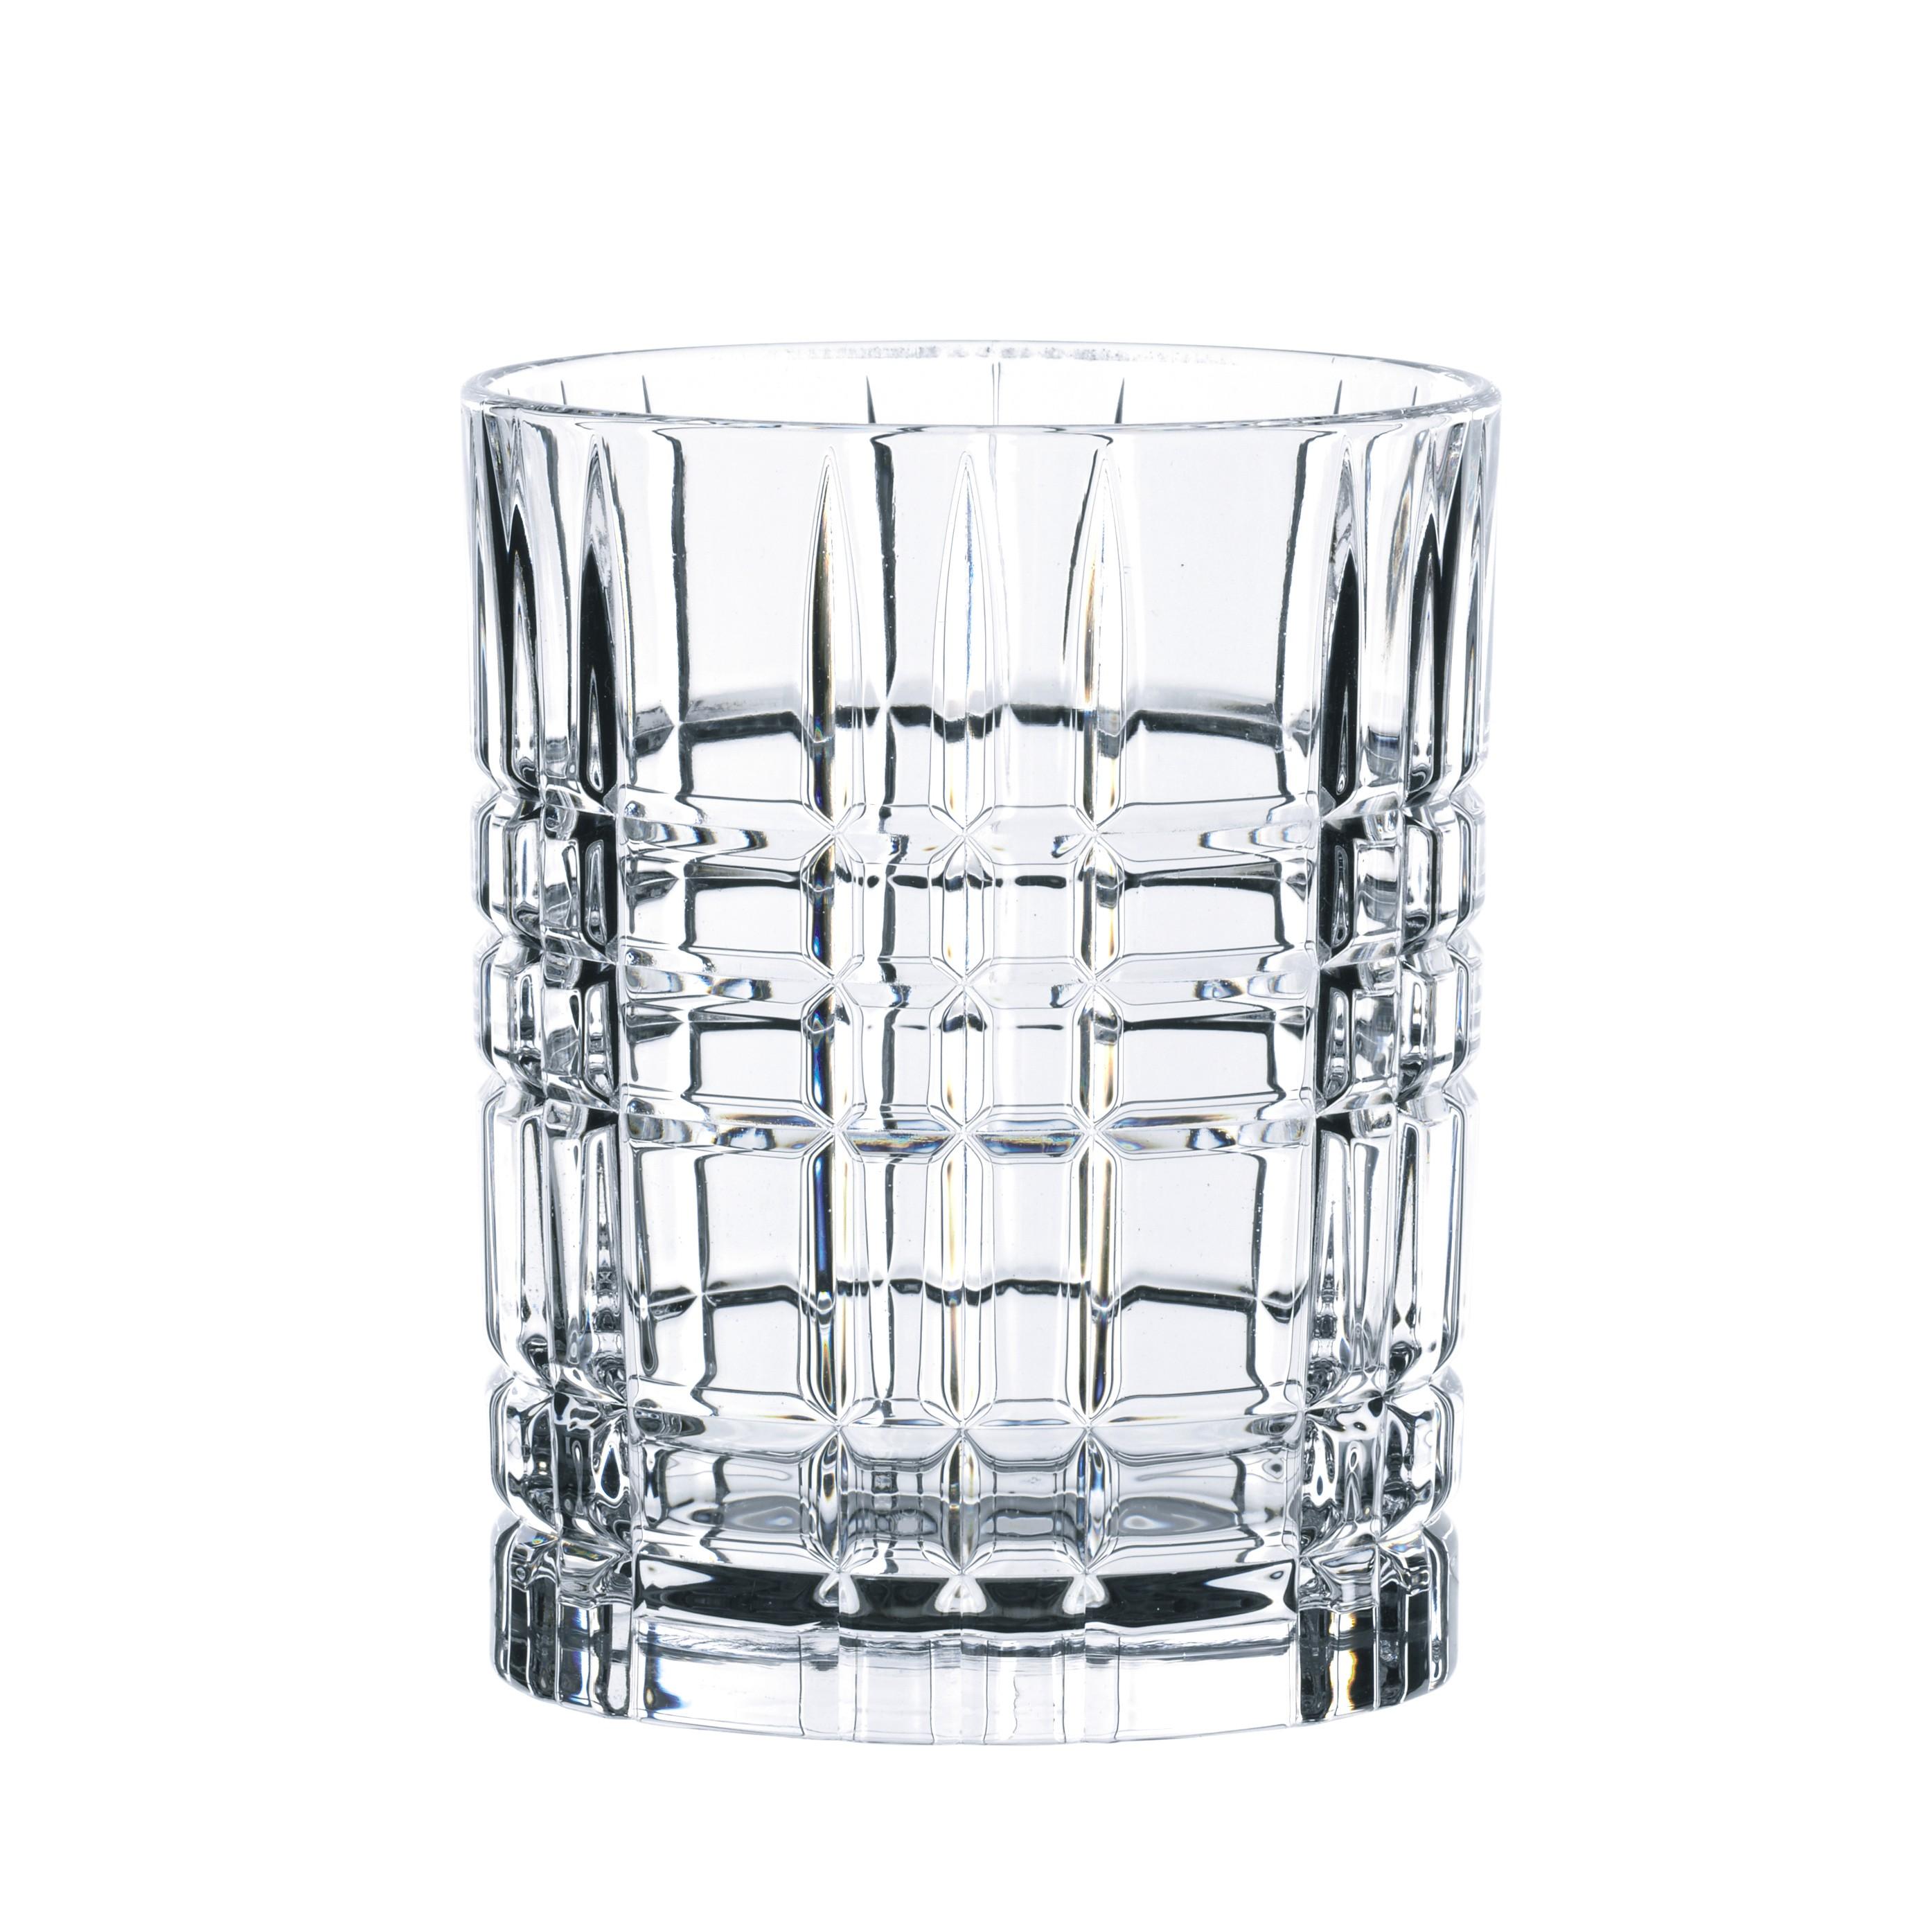 NACHTMANN Cocktailglas Square Whiskey 345ml 4er Set